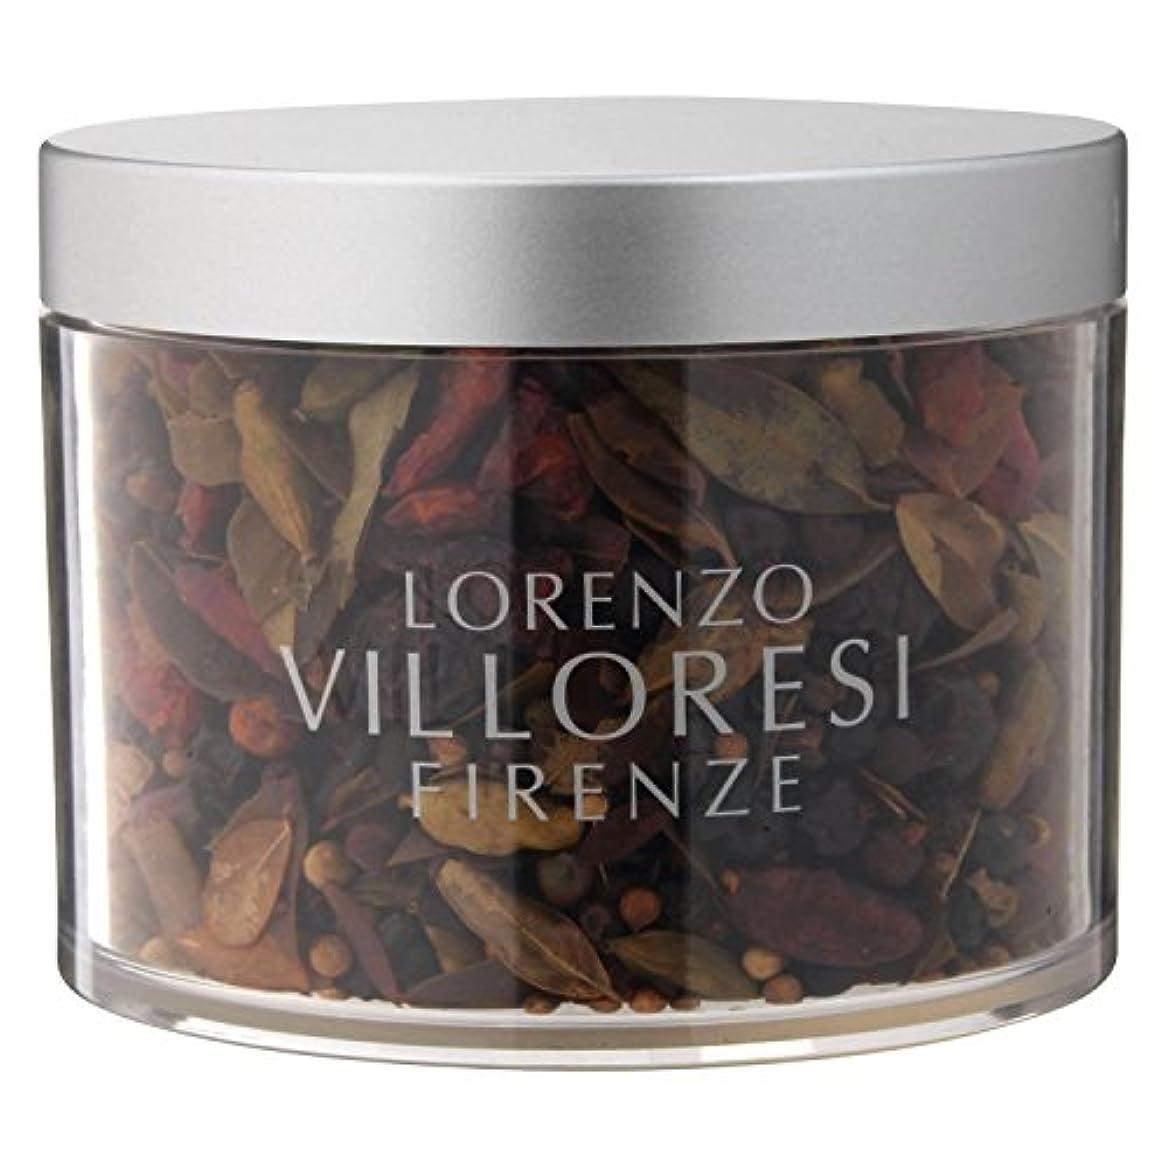 LORENZO VILLORESI ポプリ ピペルニグラム 200g